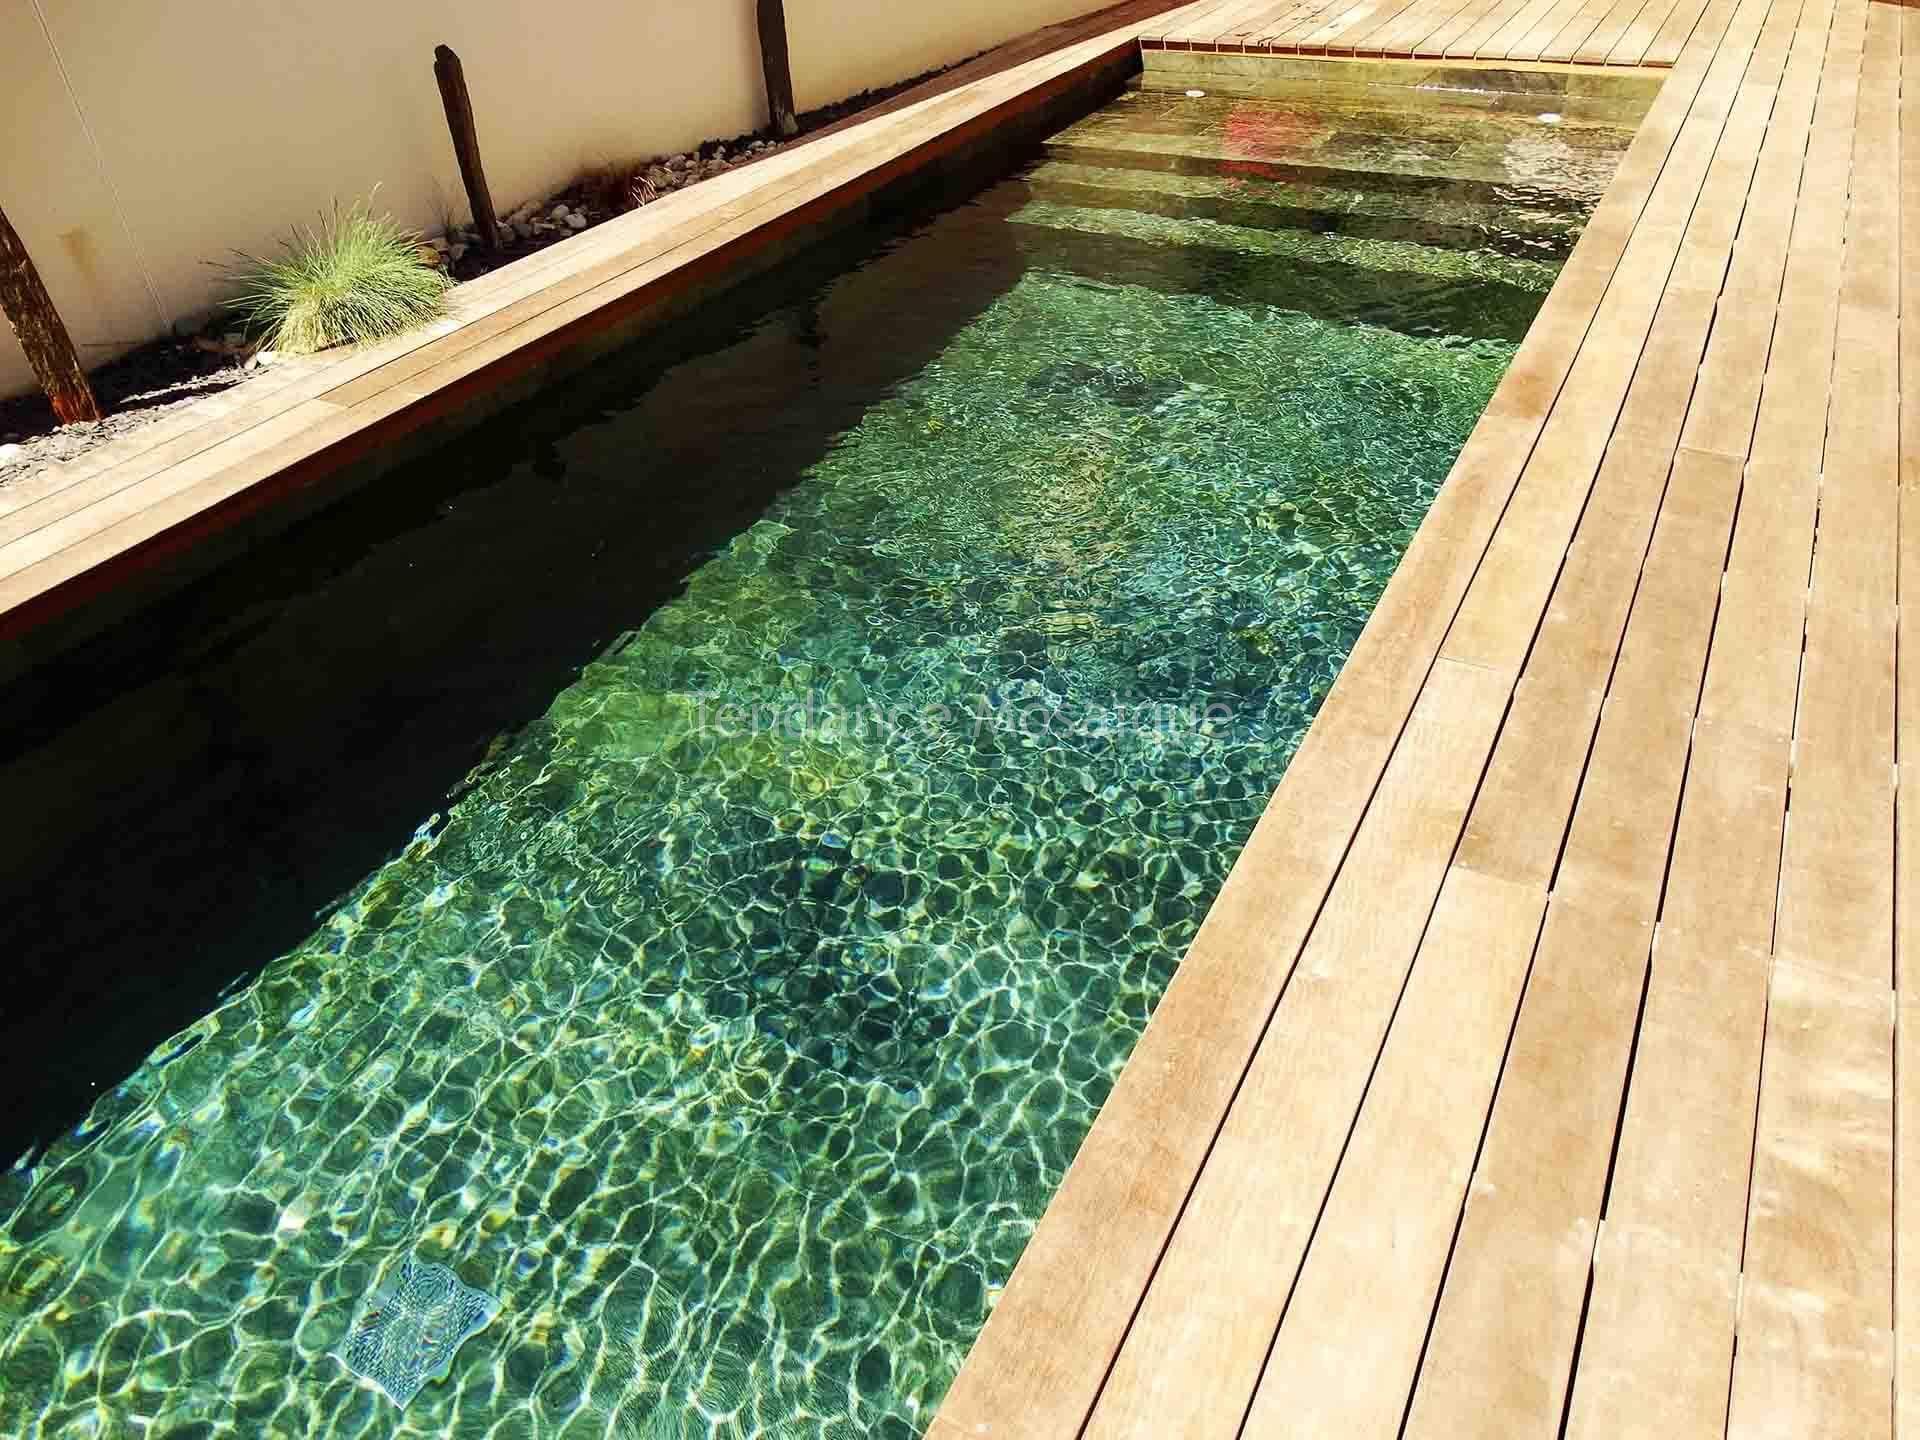 piscine en pierre naturelle quartzite r f rence silver dream carrelage piscine. Black Bedroom Furniture Sets. Home Design Ideas